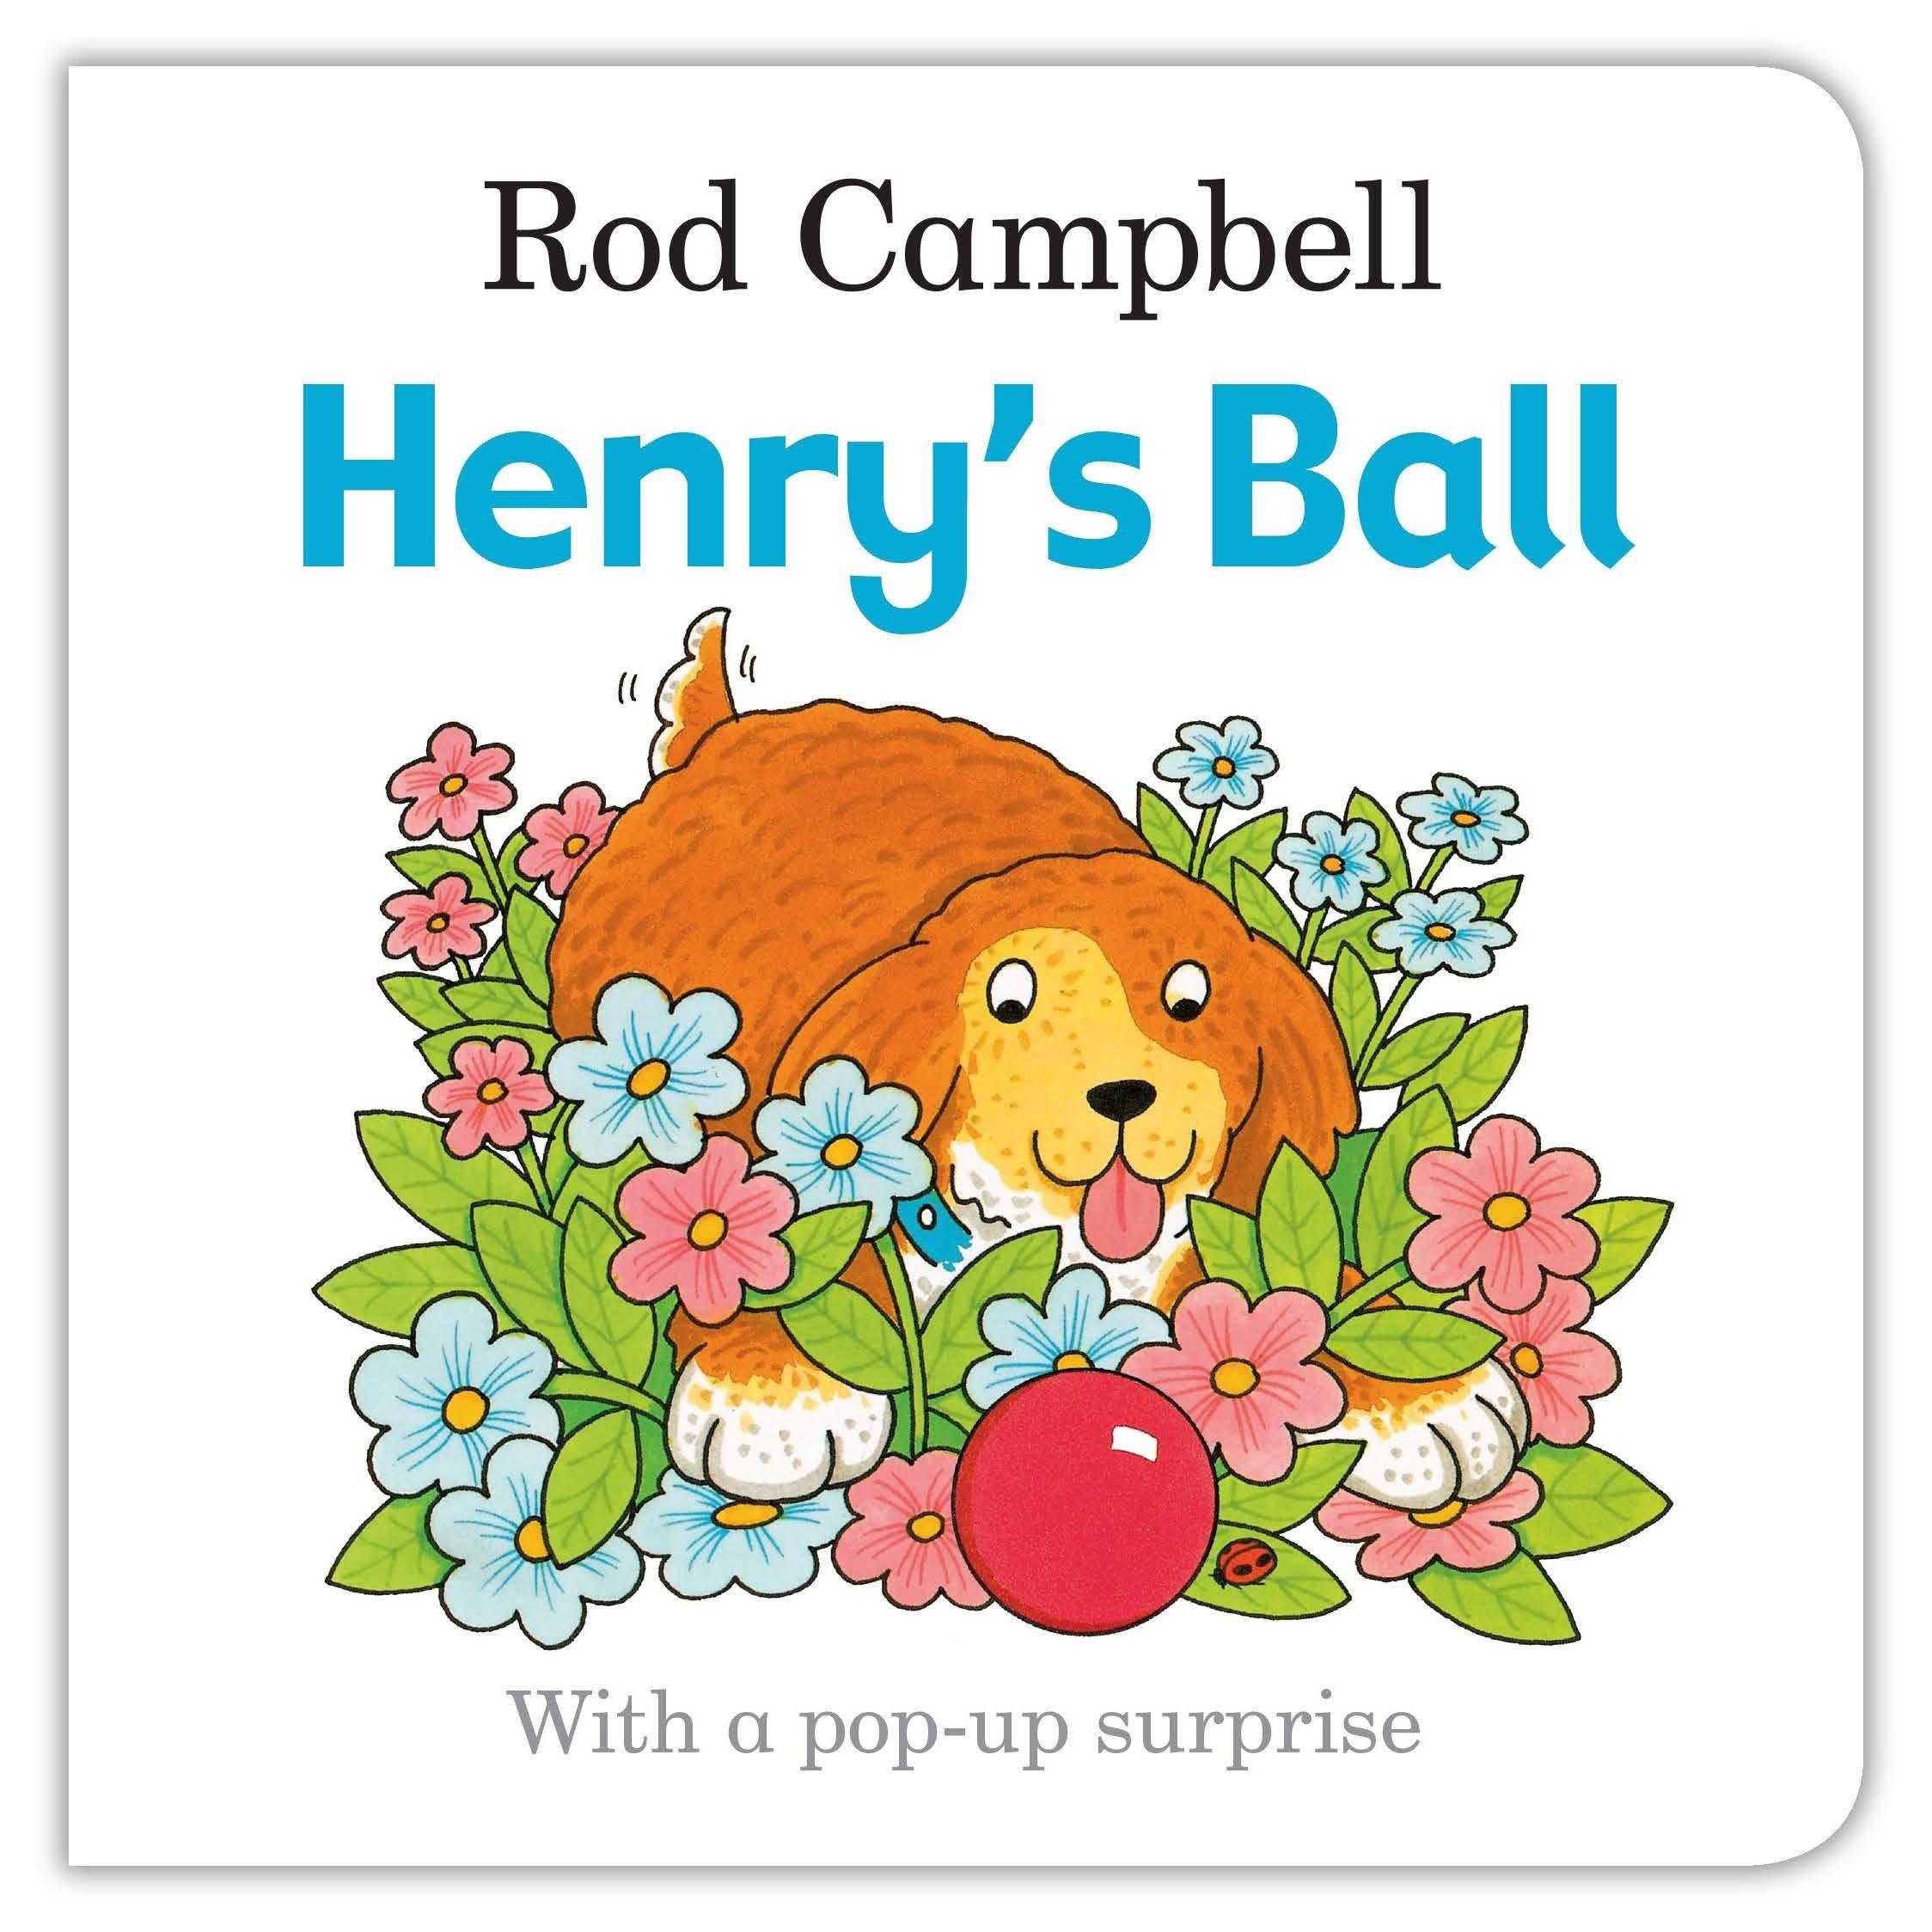 Henry's Ball funko pop vinyl фигурка dragon ball z krillin